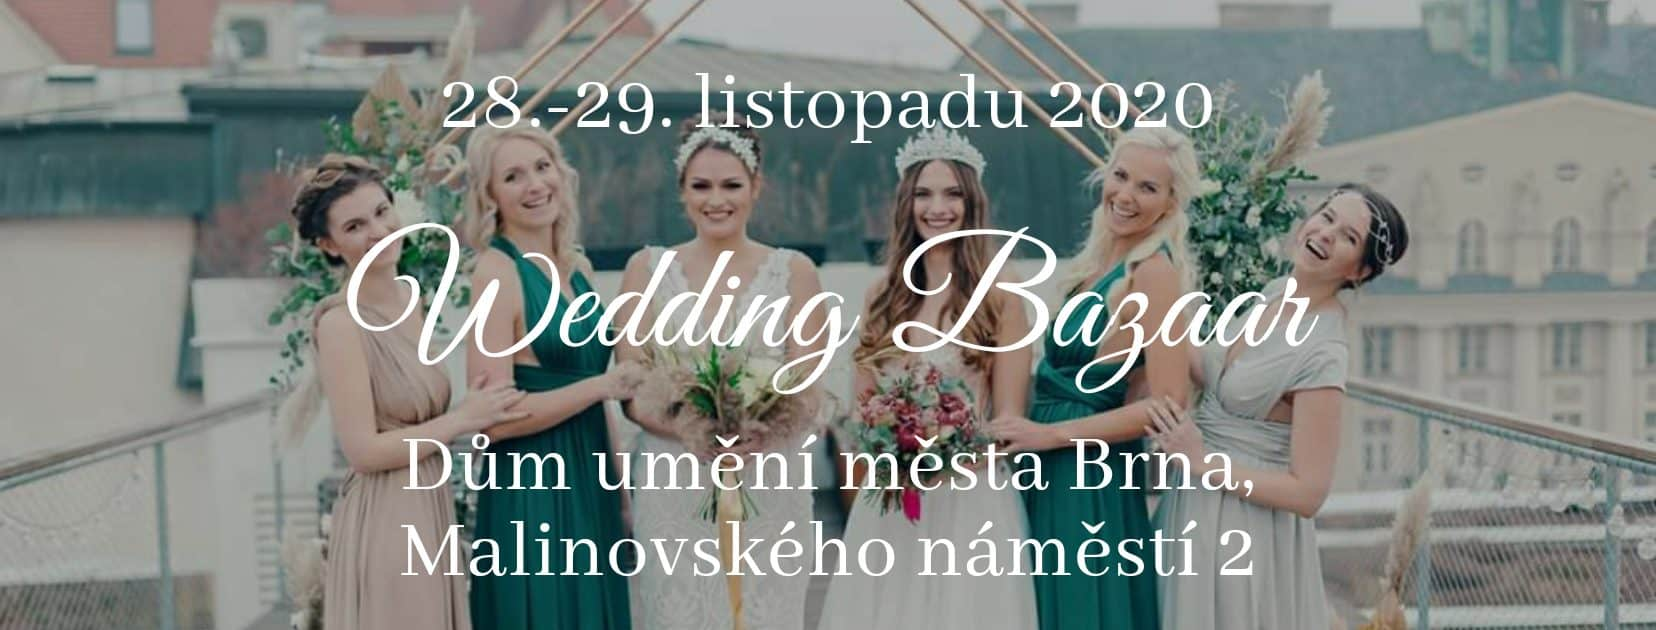 Wedding Bazaar - svatební inspirace jinak...